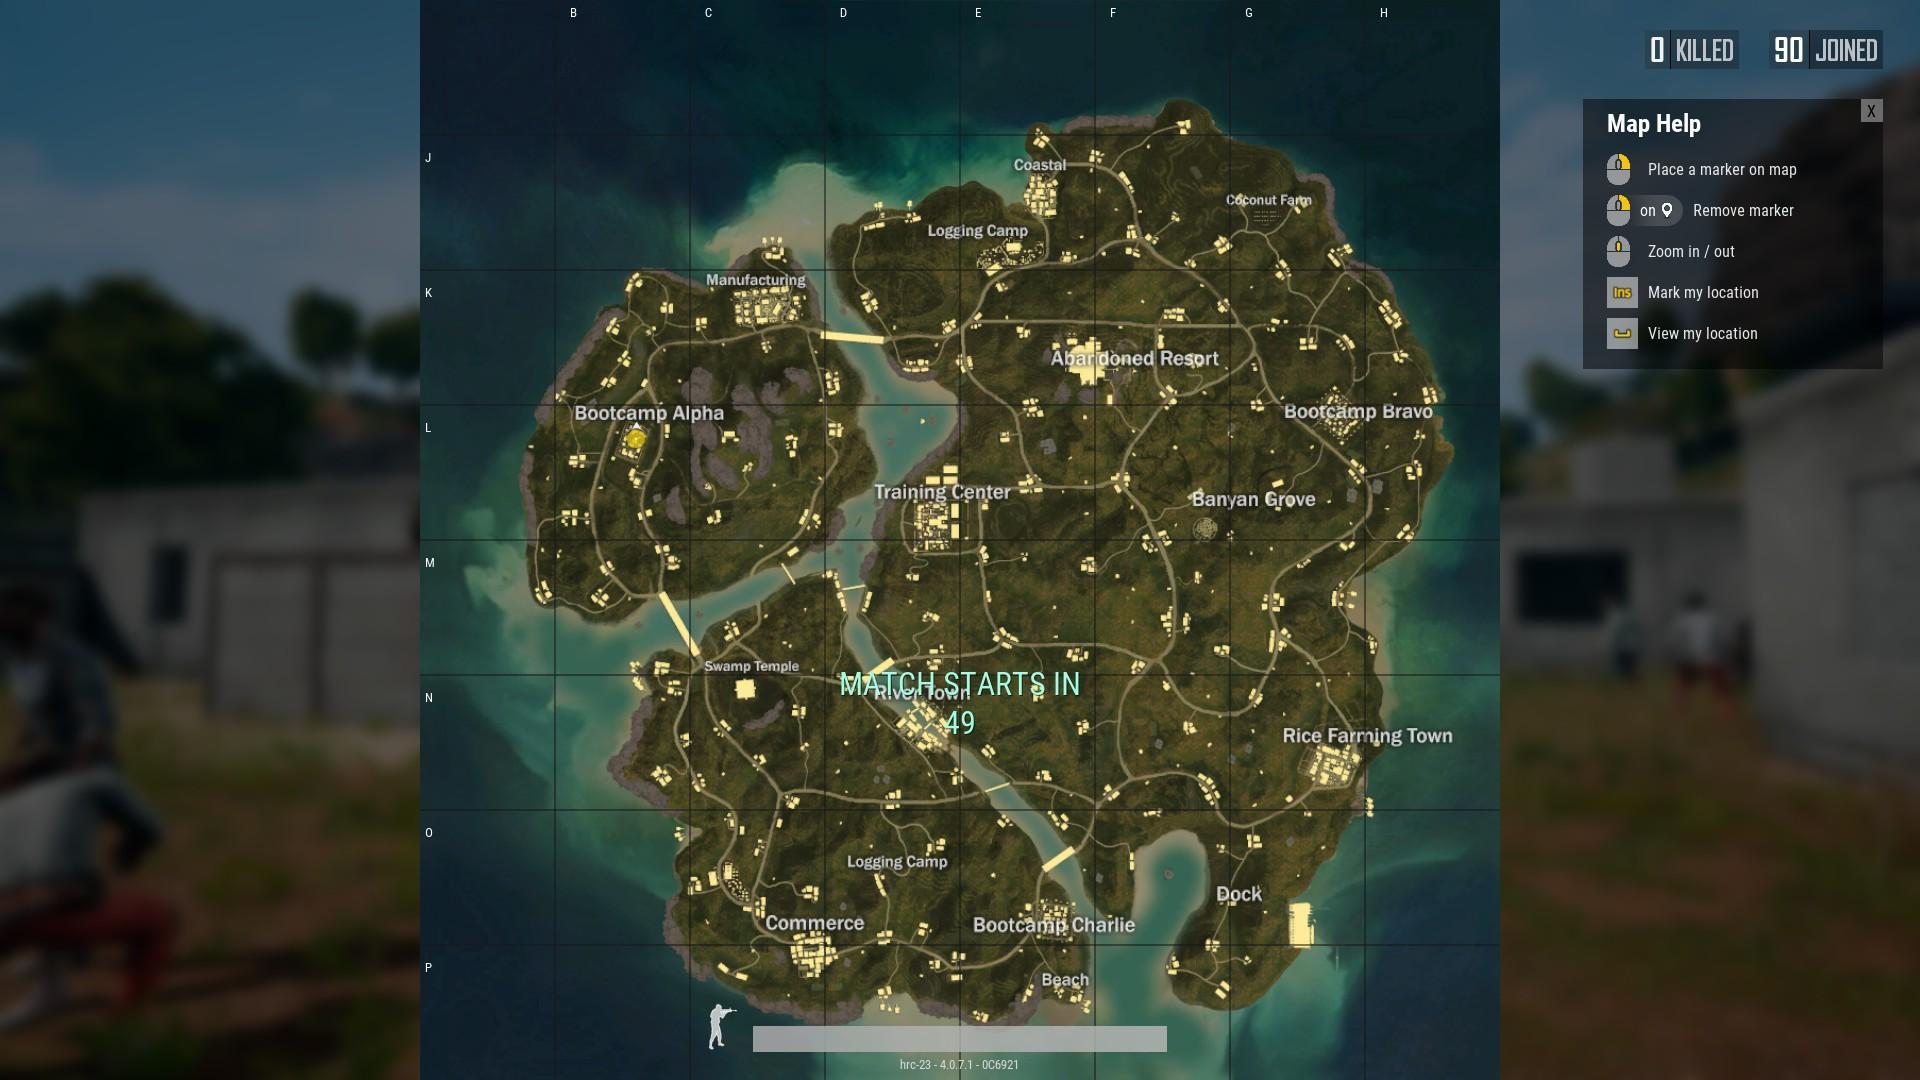 Sanhok is the smallest PUBG map yet